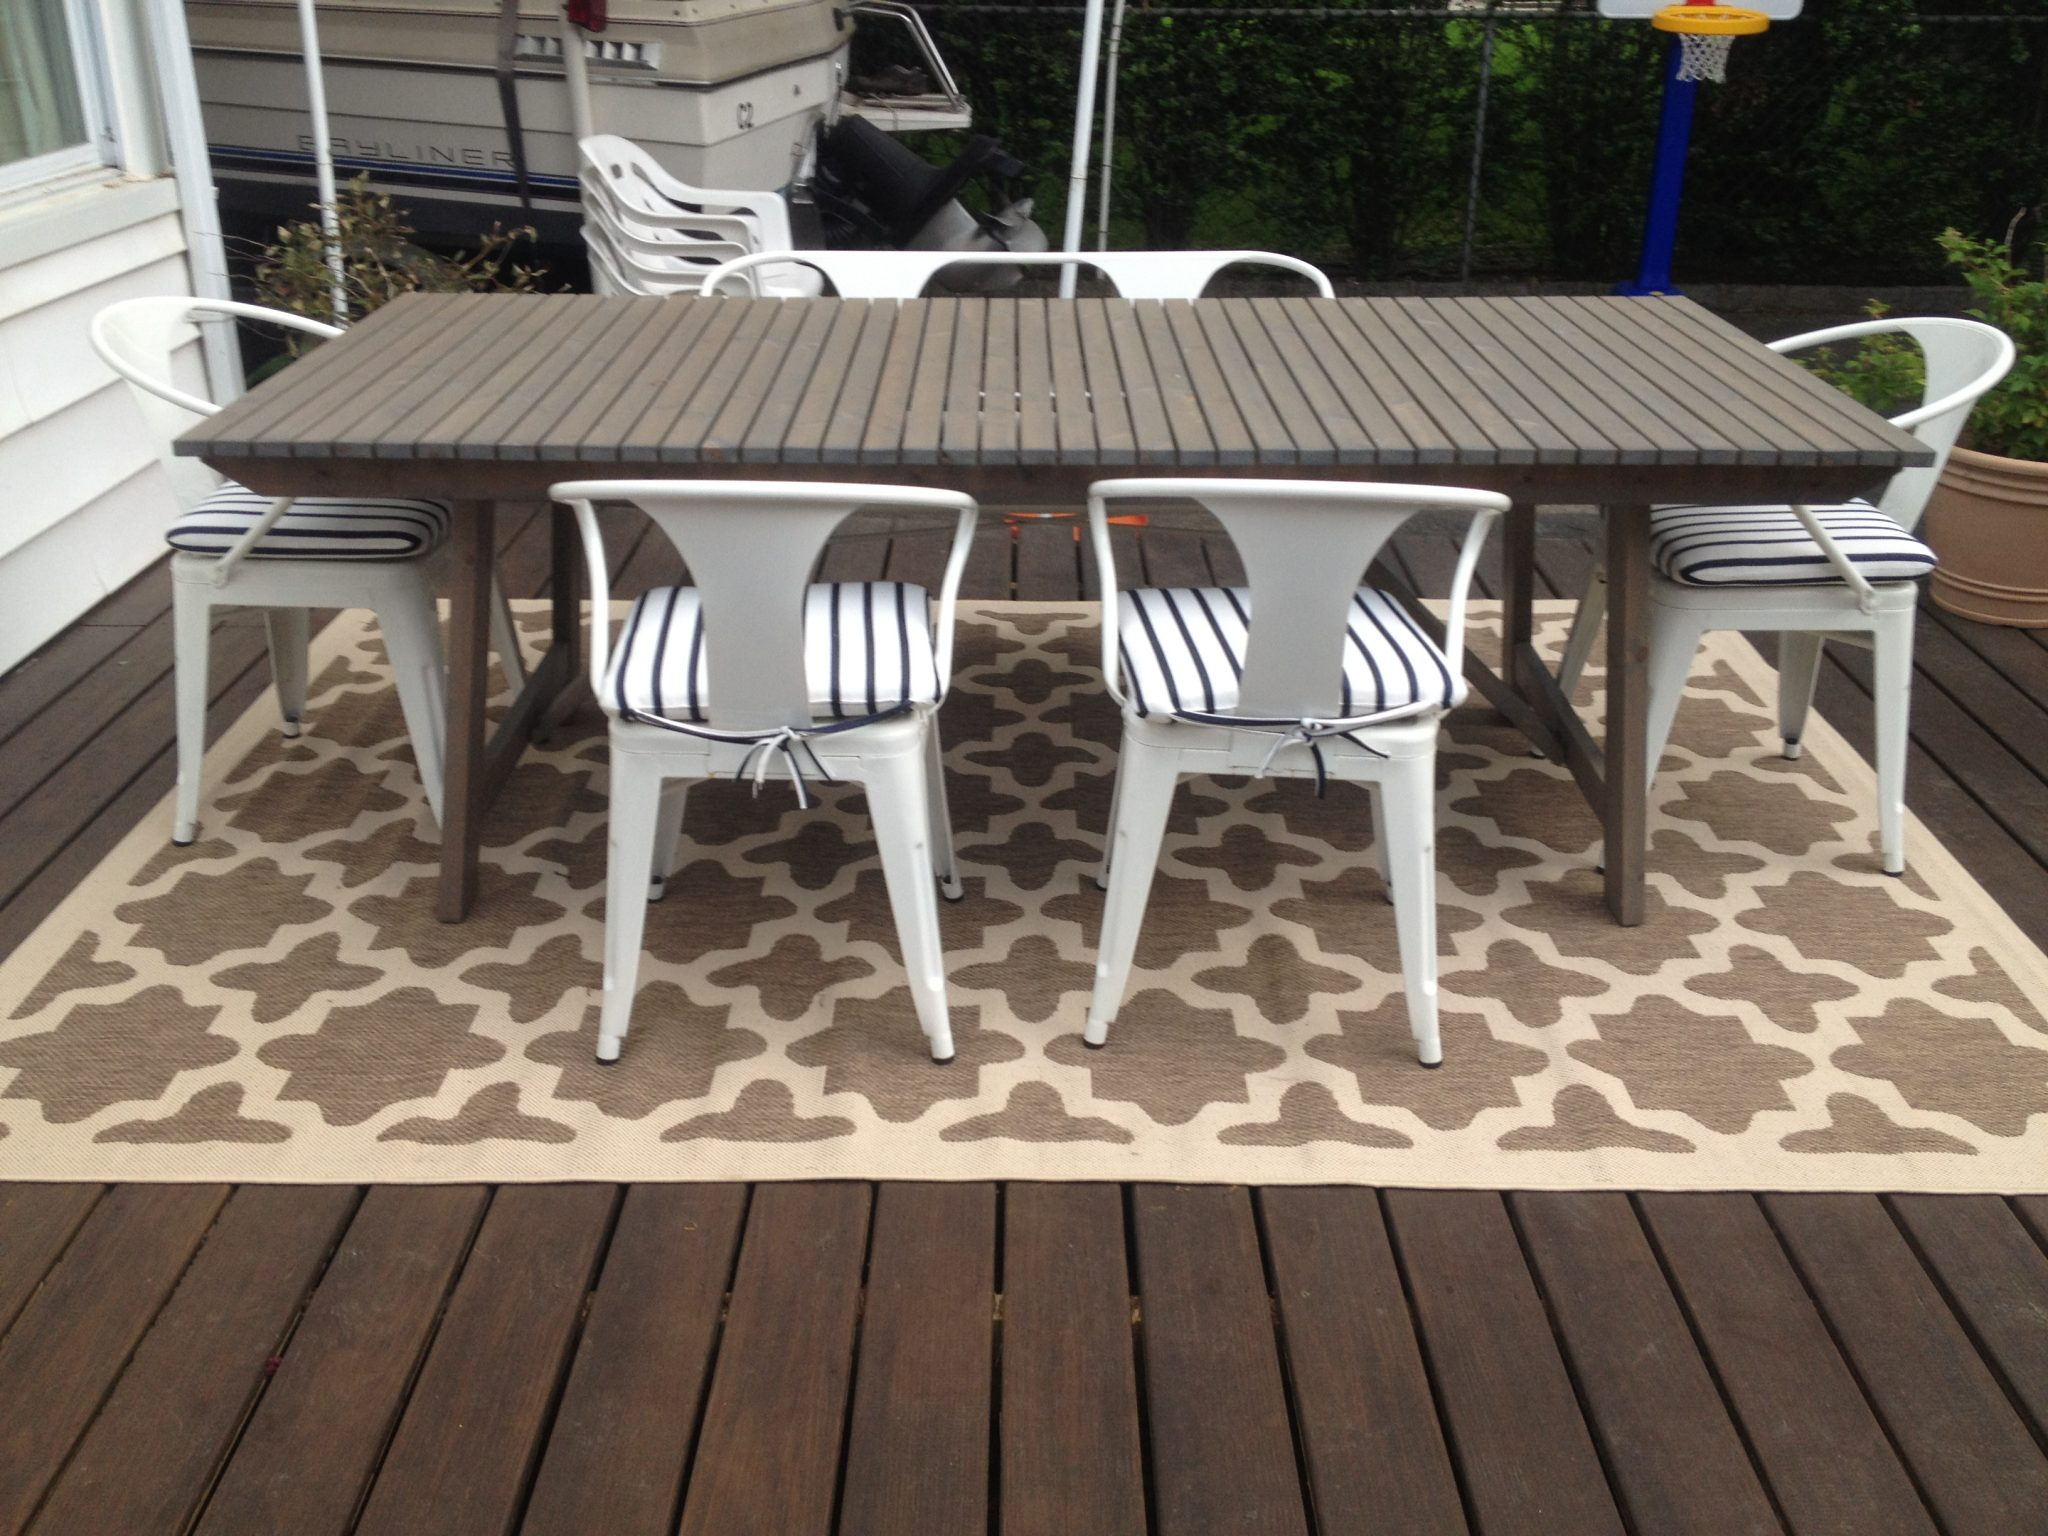 Patio Progress: Outdoor rug